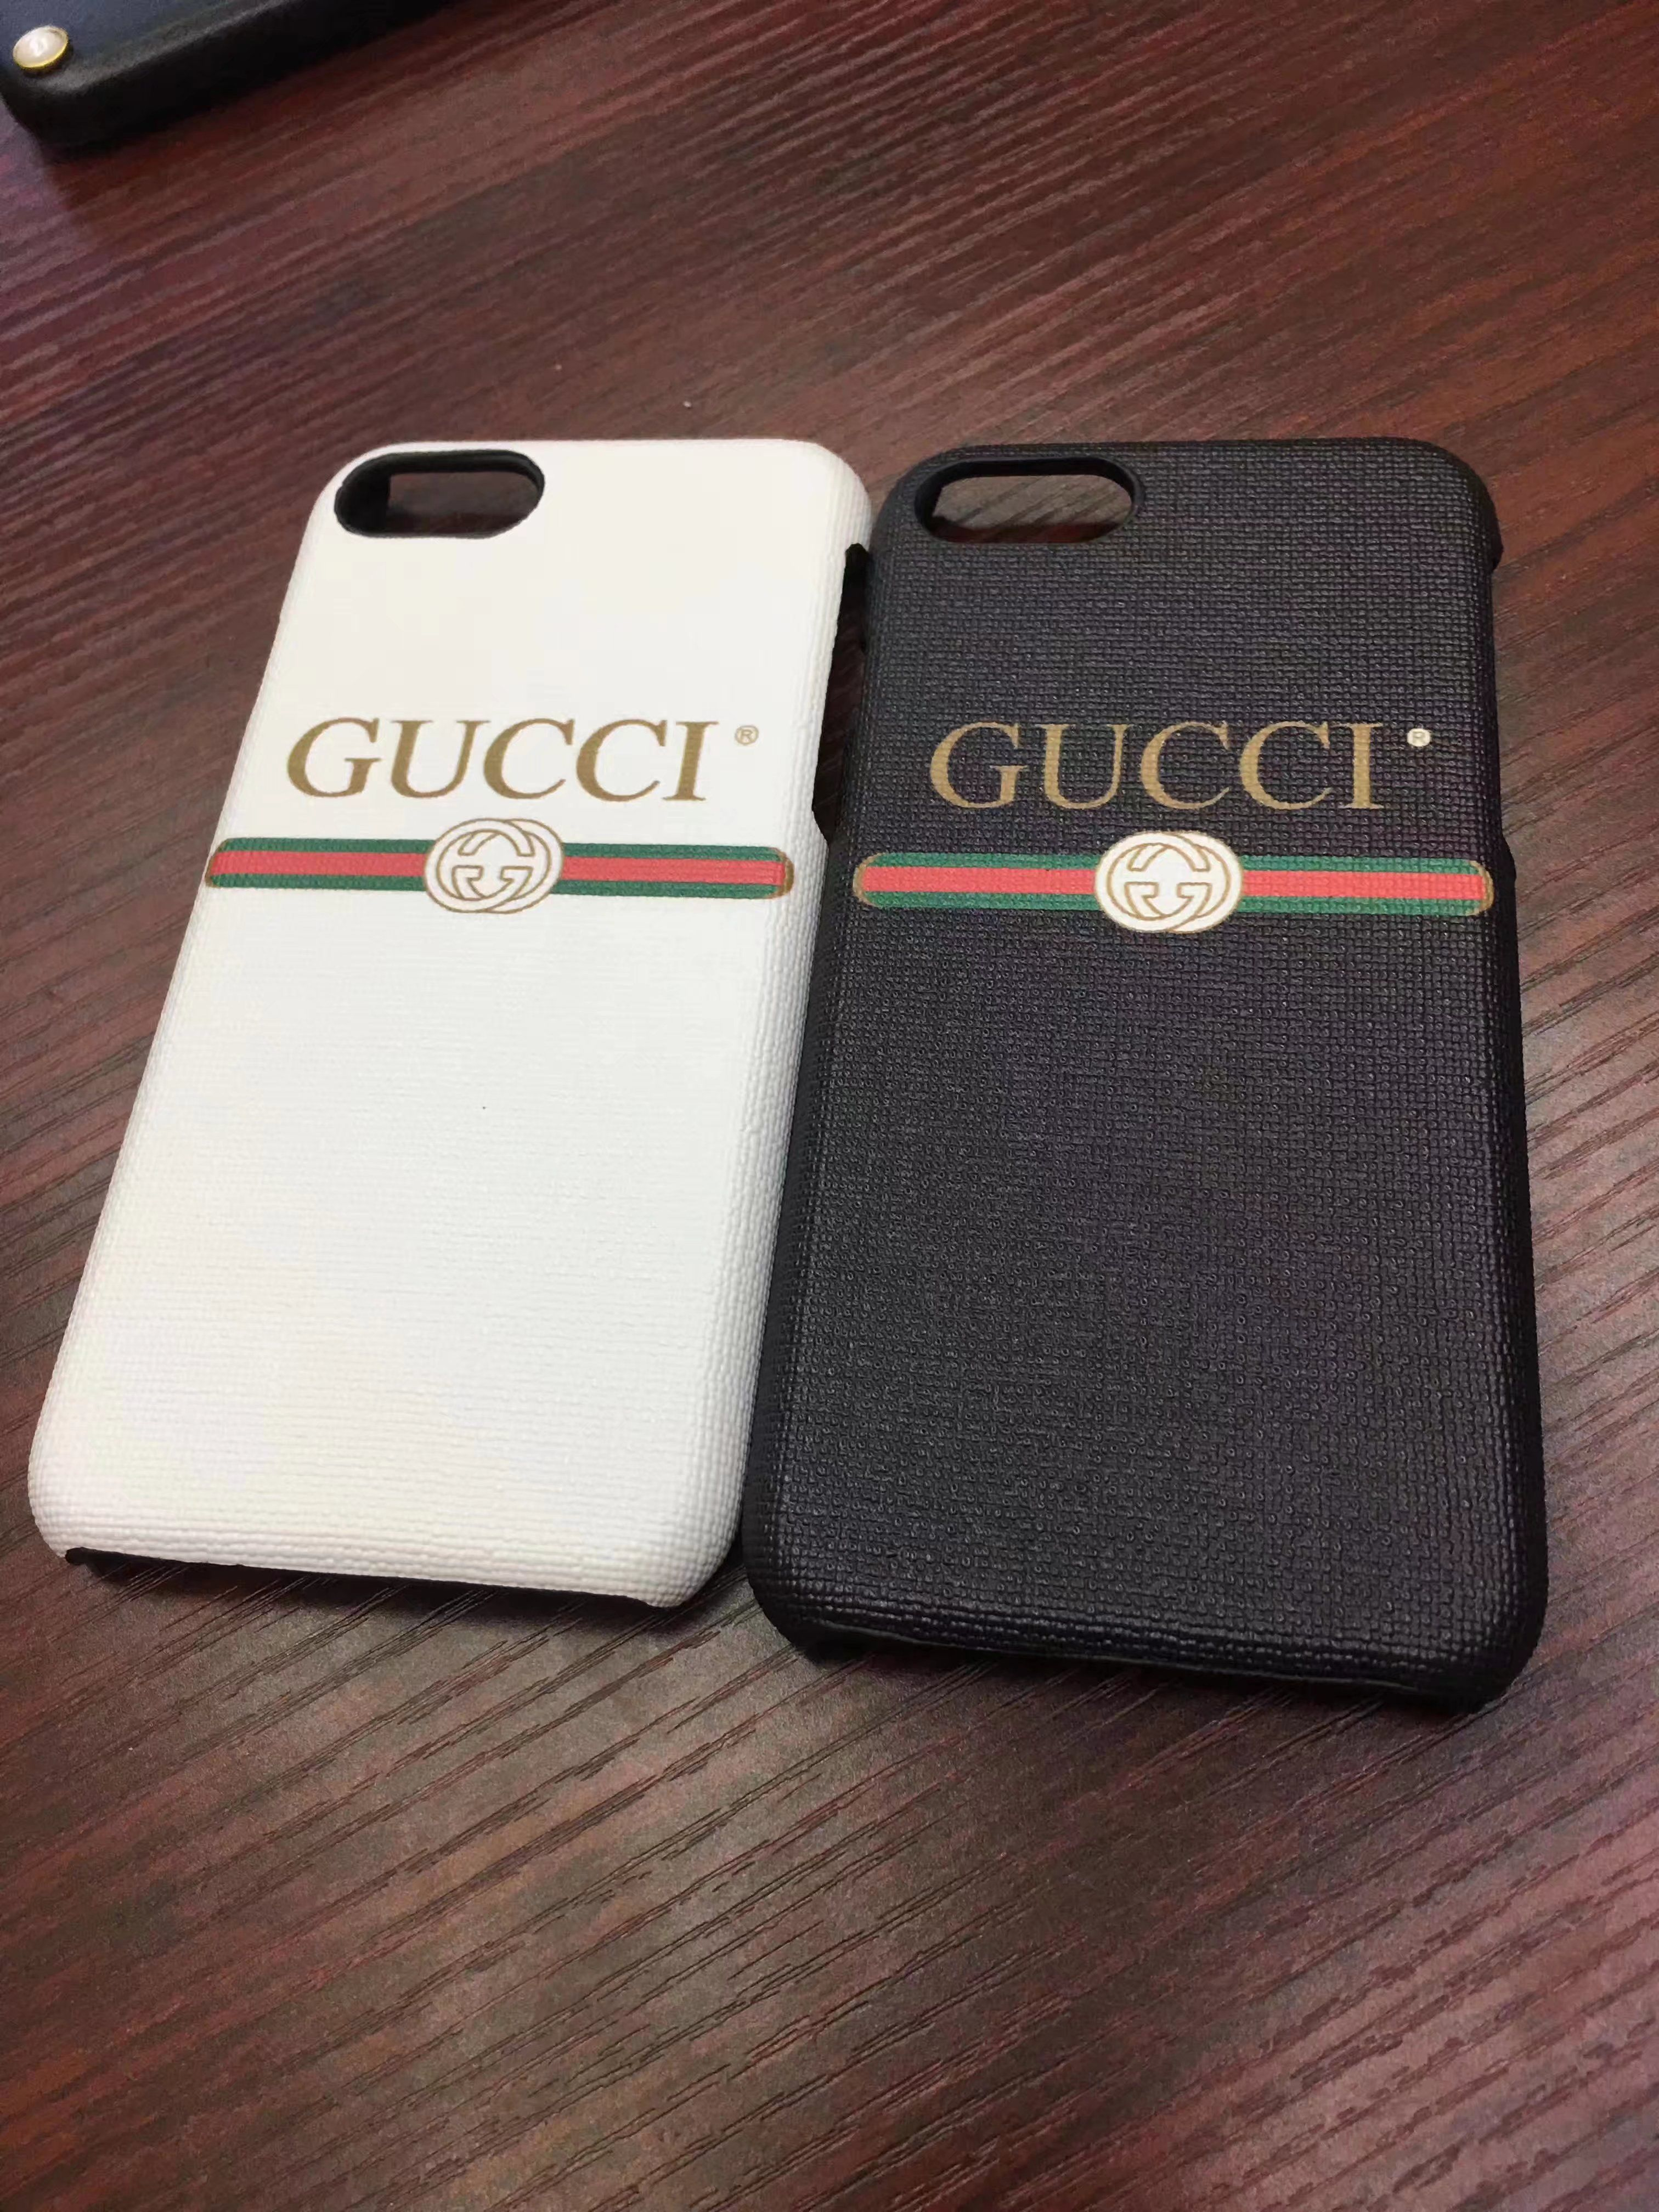 premium selection b895f 71666 グッチGucciシンプルiPhone8/7s/6plusケース アイフォン7plus/6s ...